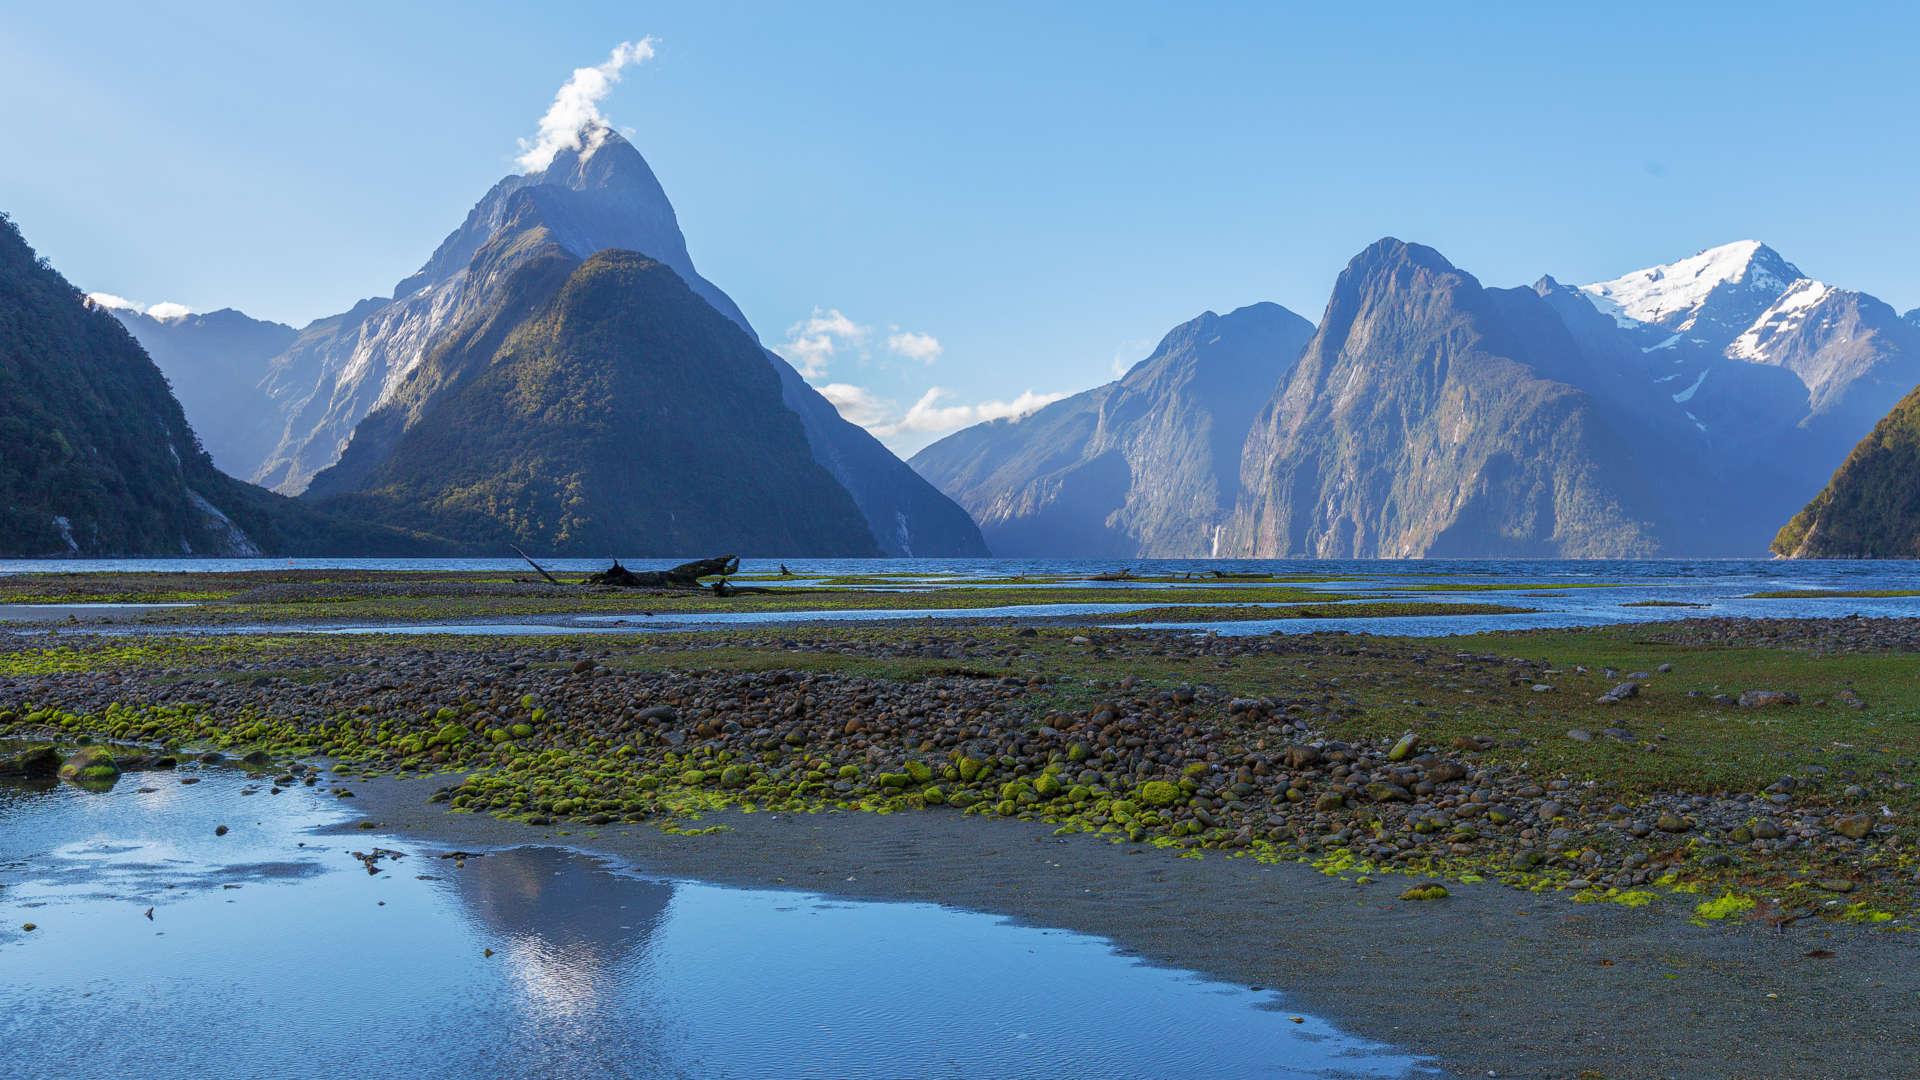 Custom-Travel-Planner-Network-New-Zealand-Milford-Sound